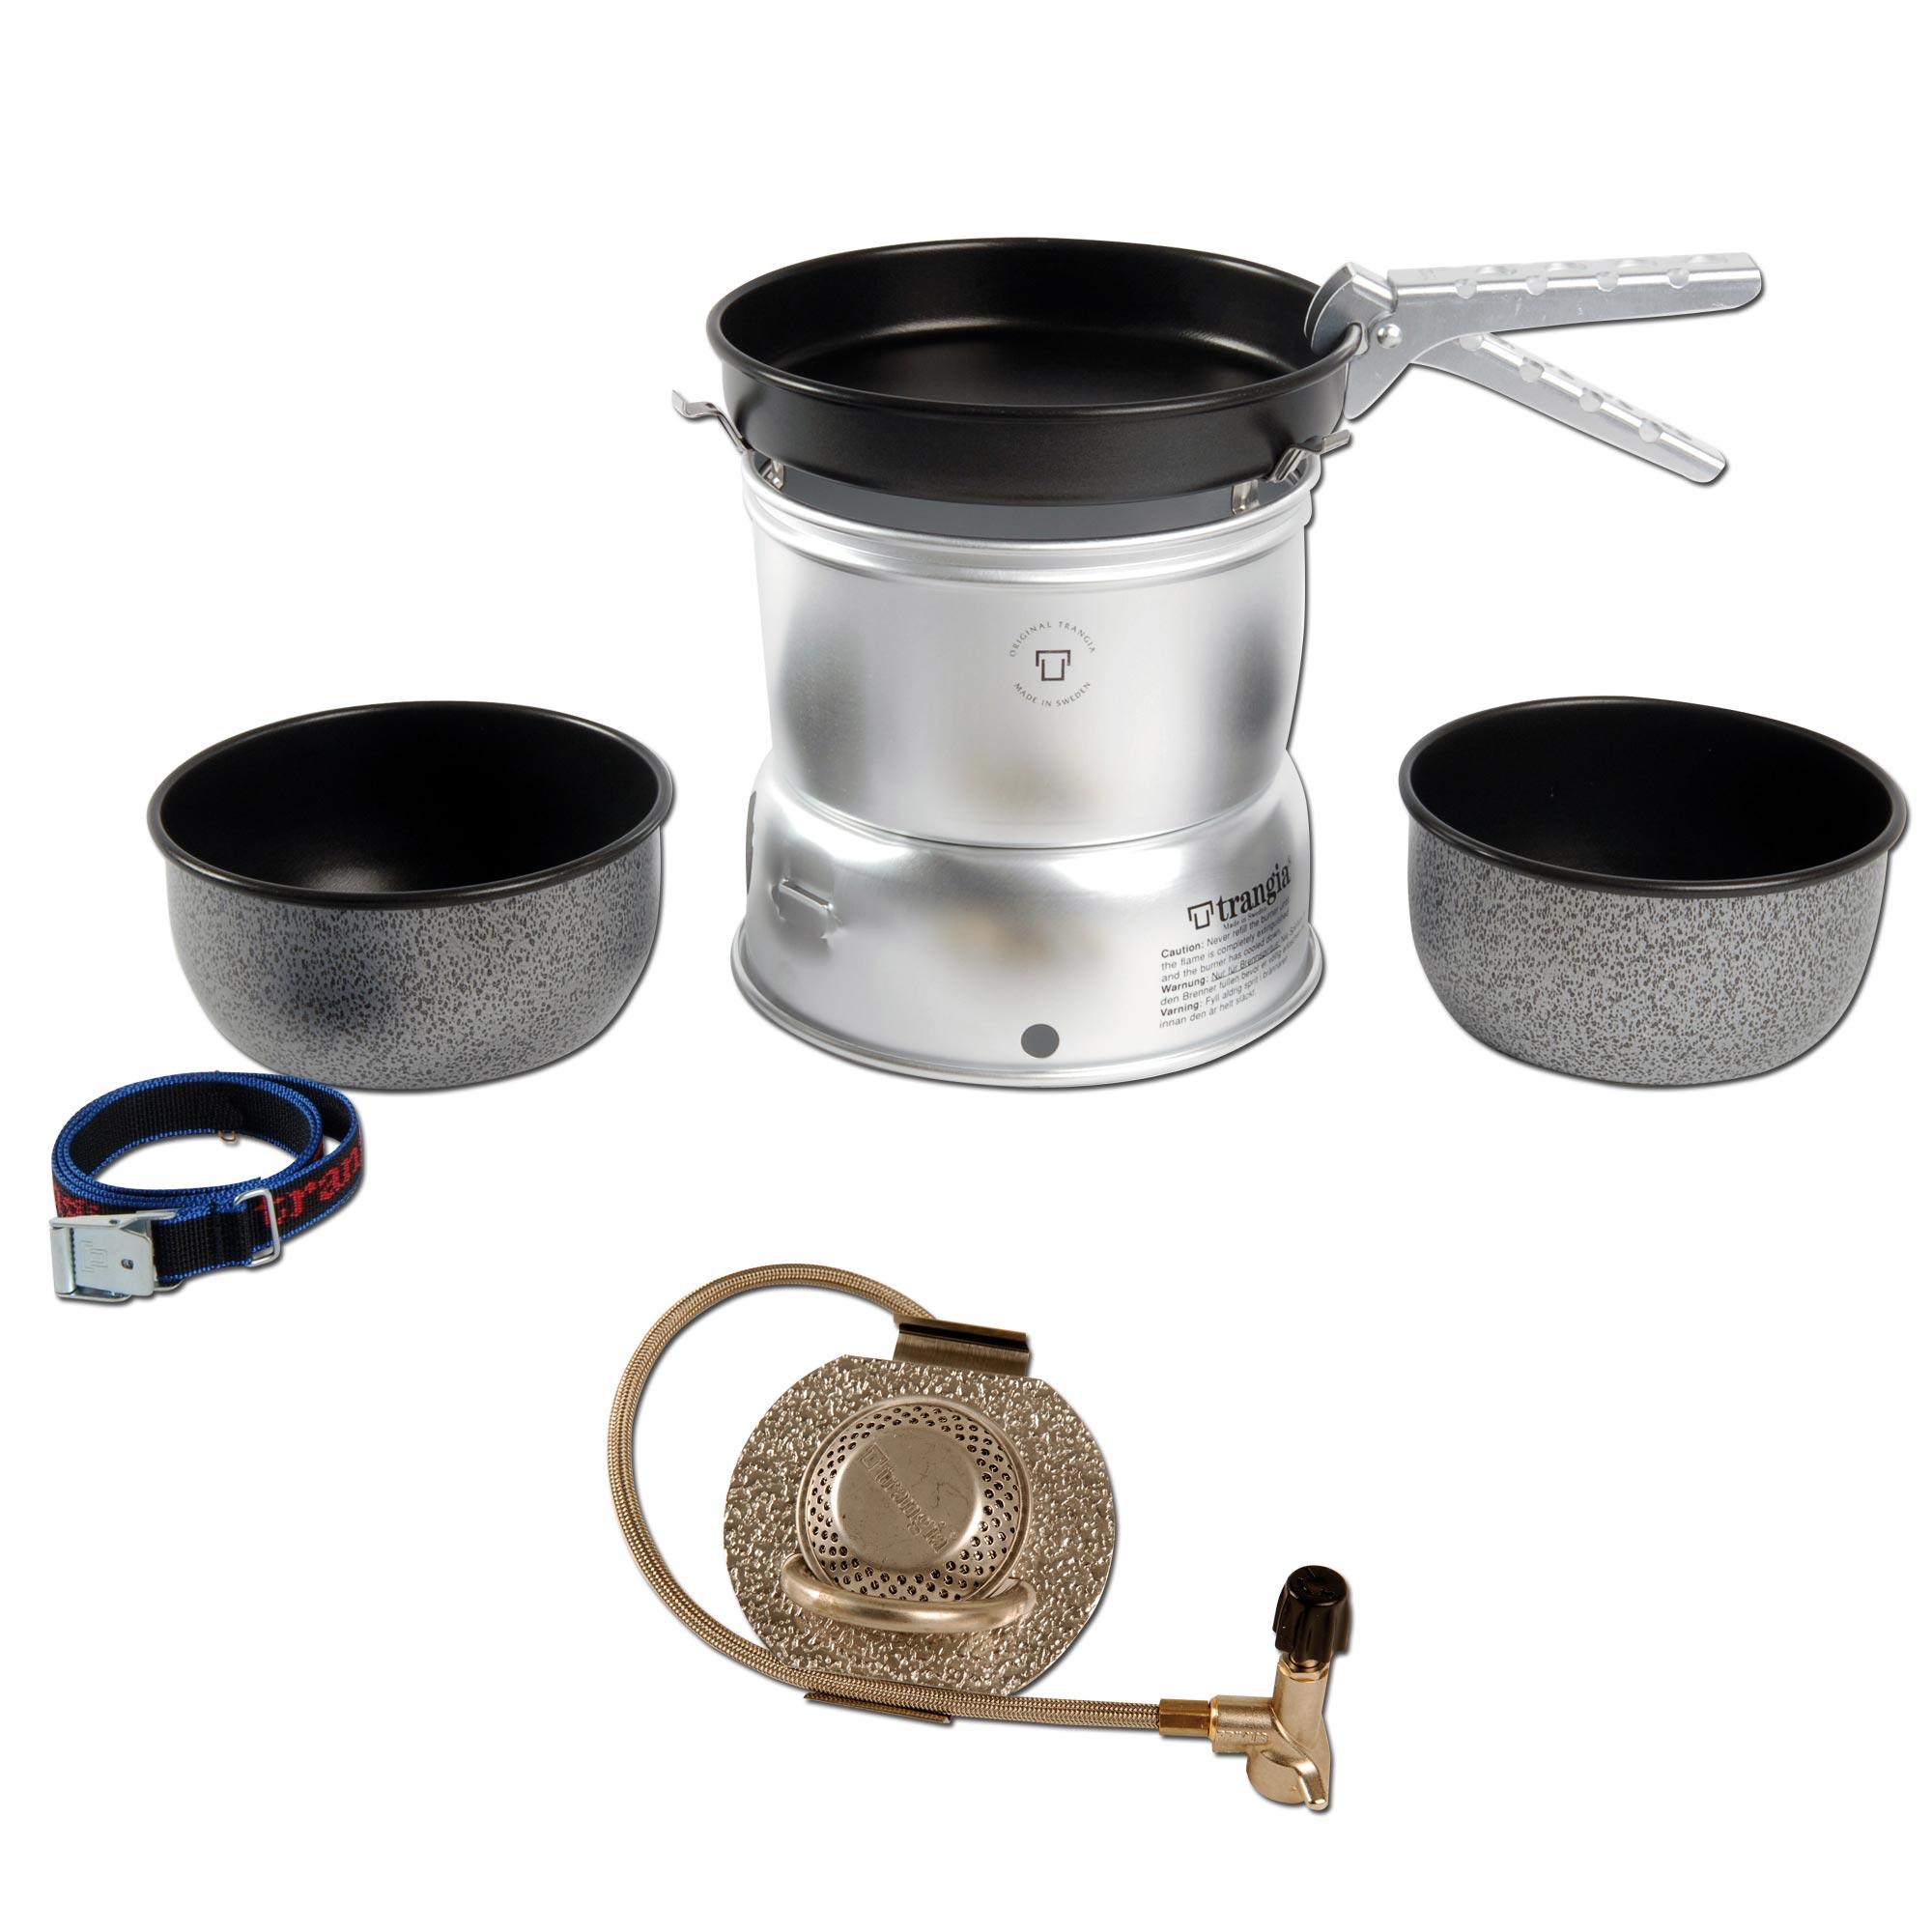 Set de cocina Trangia 27-5 UL (Gas)